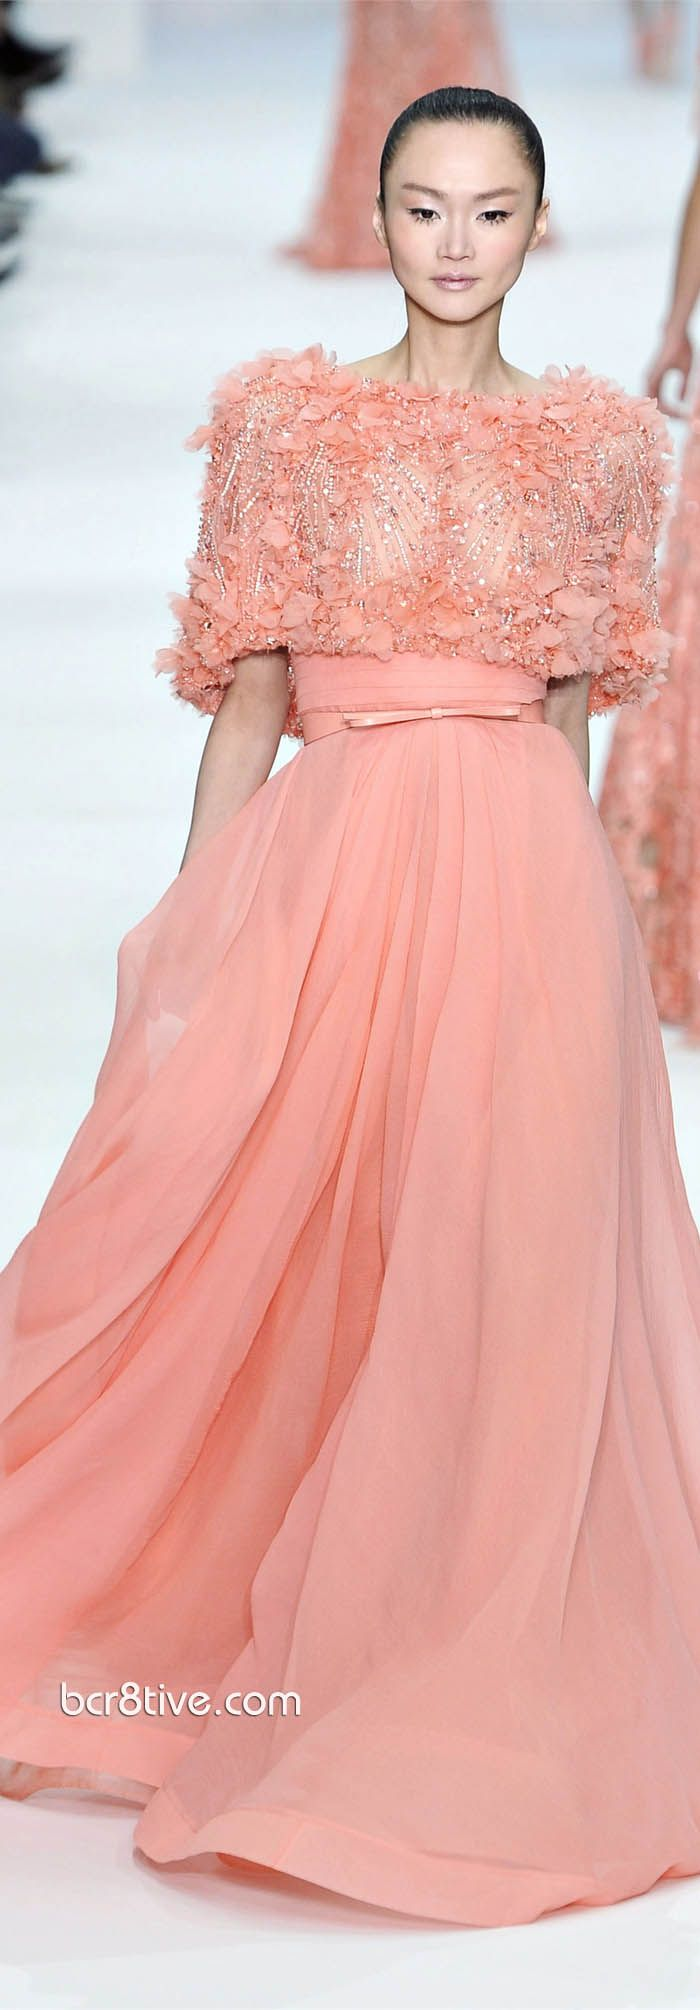 Elie Saab Spring Summer 2012 Haute Couture | Pinterest | Melocotones ...